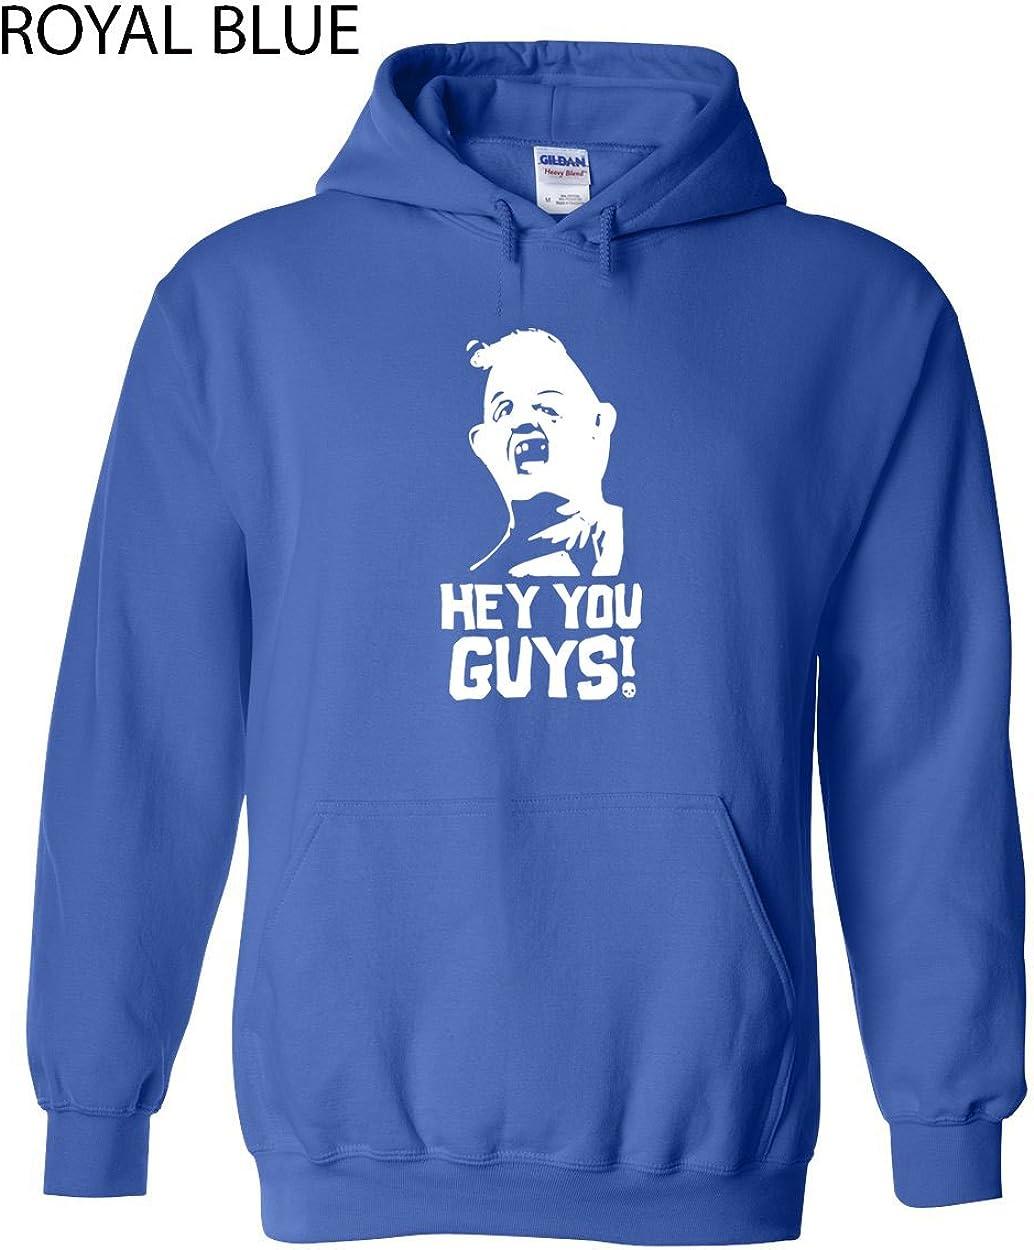 Swaffy Tees 233 Hey You Guys Adult Hooded Sweatshirt